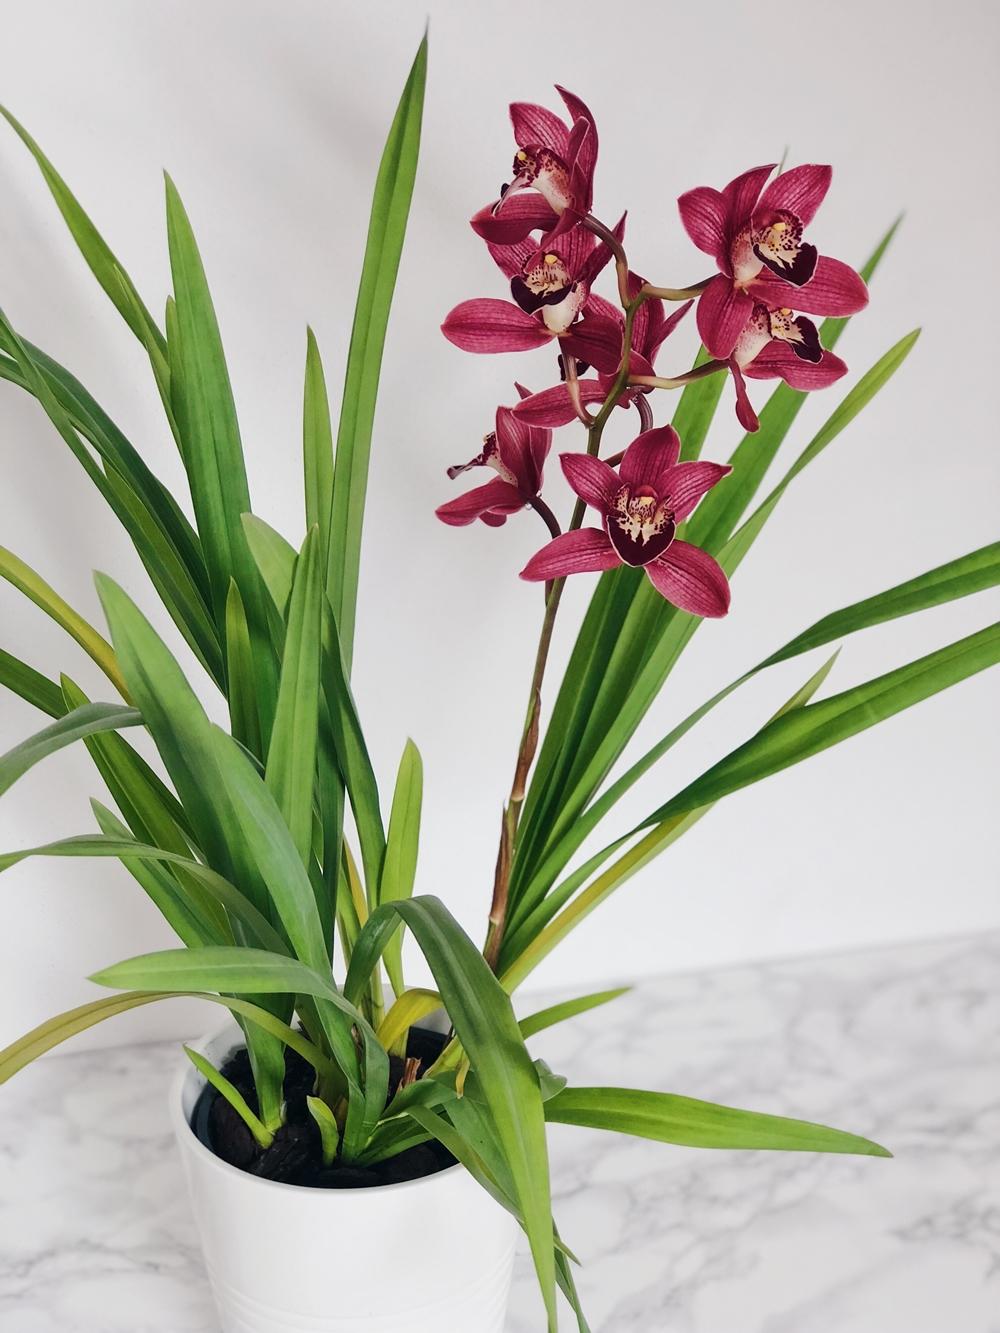 zimmerpflanzen f r pralle sonne ostseesuche com. Black Bedroom Furniture Sets. Home Design Ideas